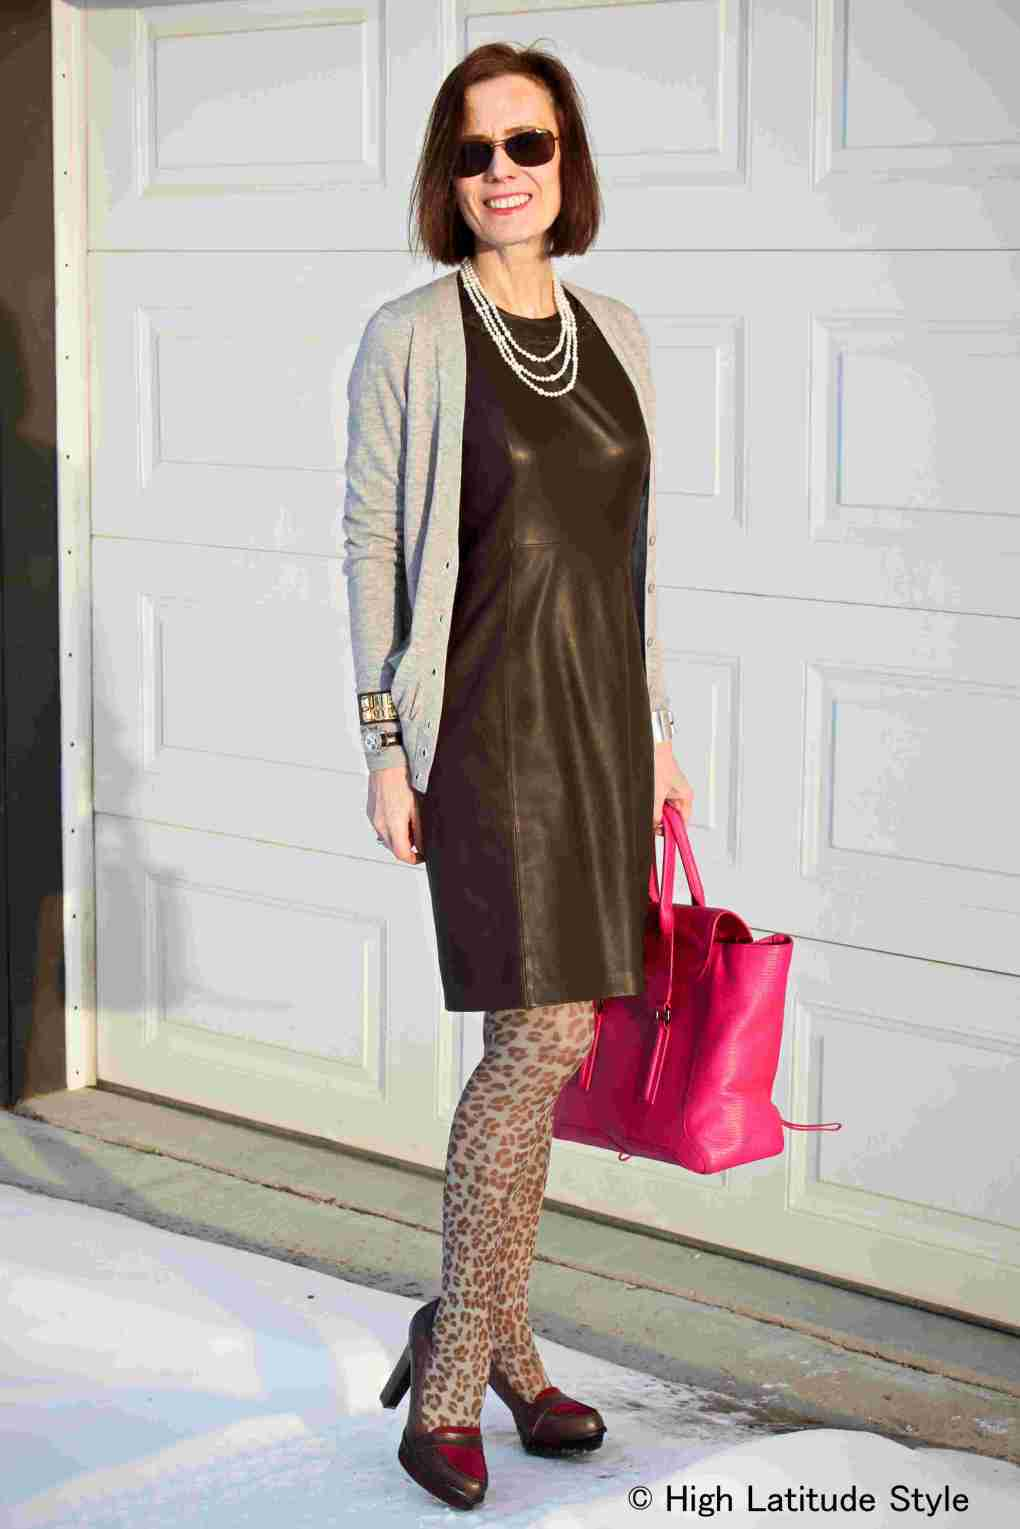 #fashionover40 woman in leather sheath